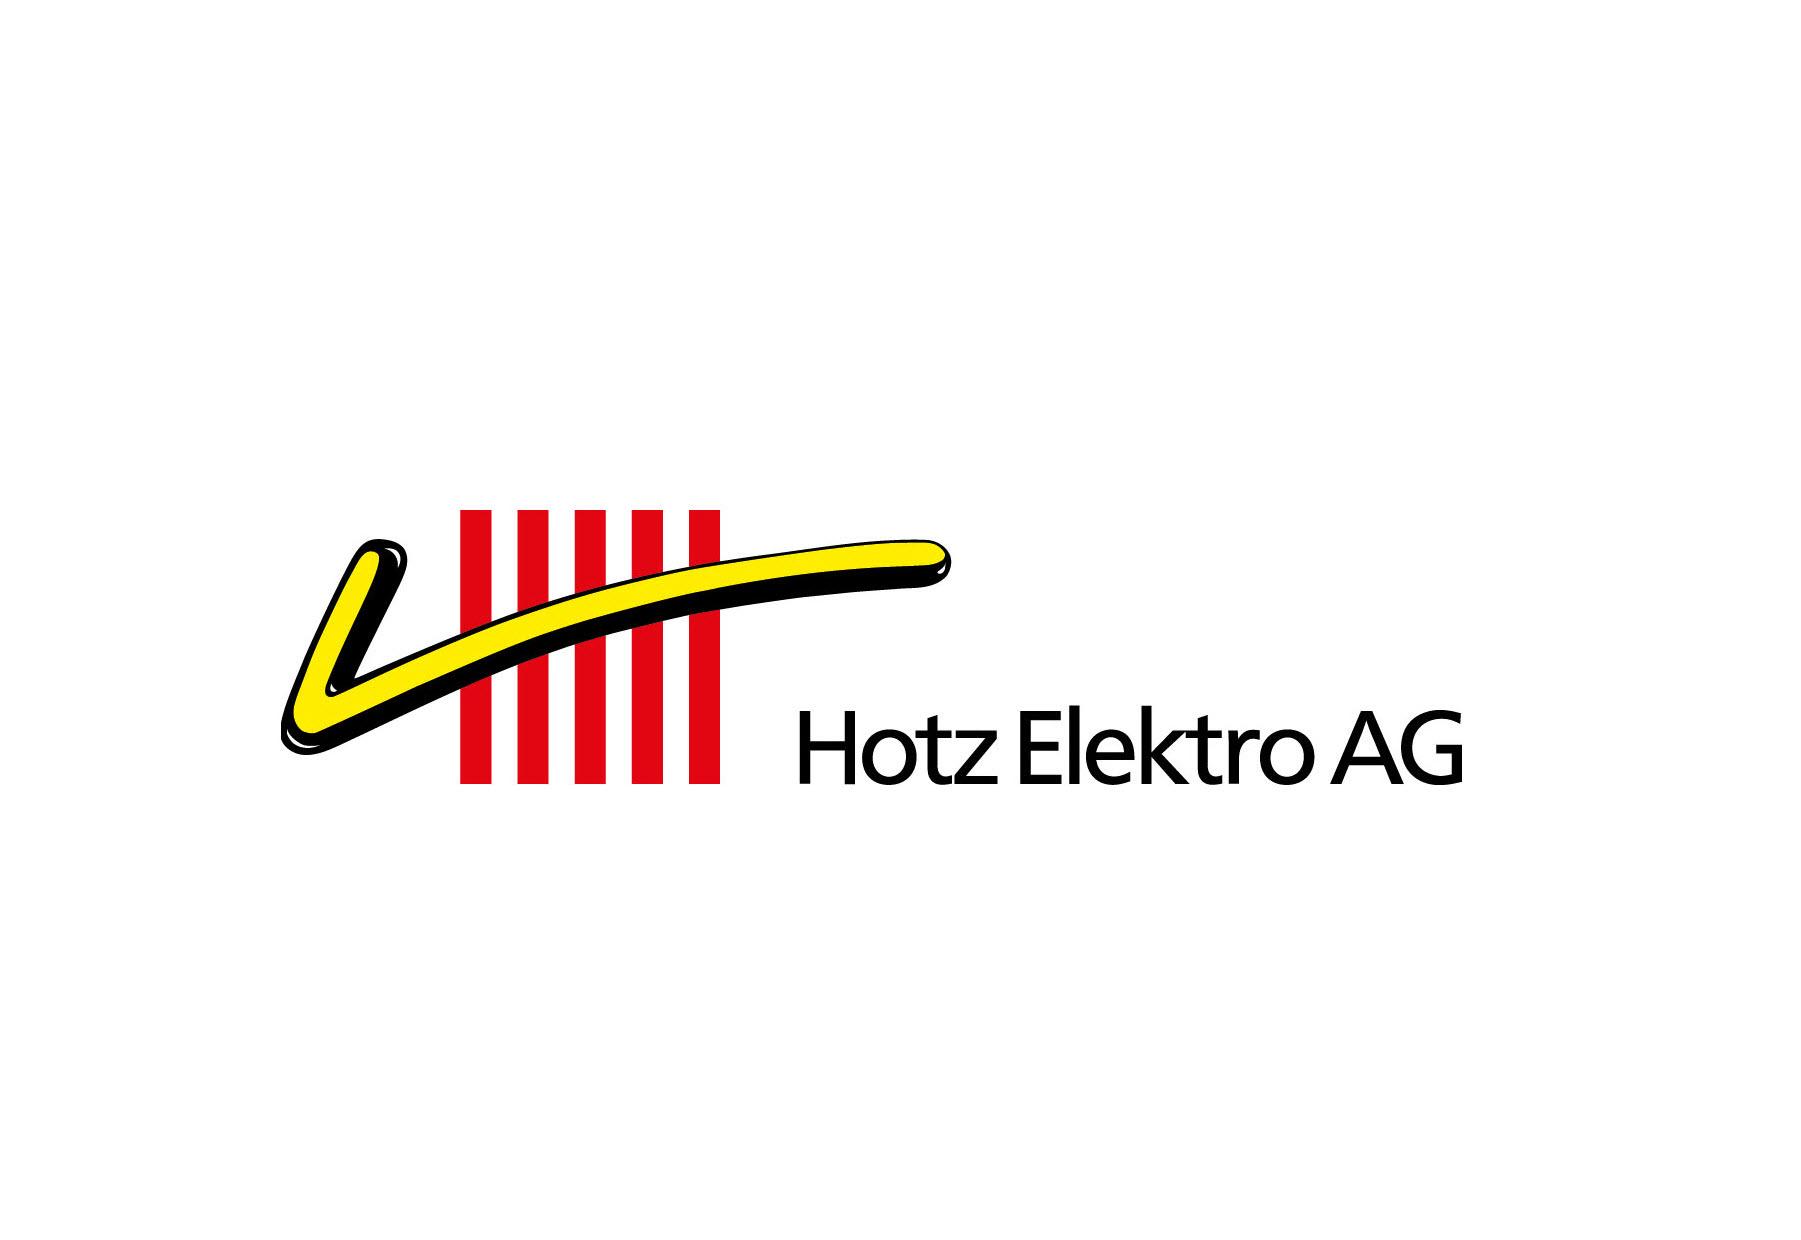 Hotz Elektro AG